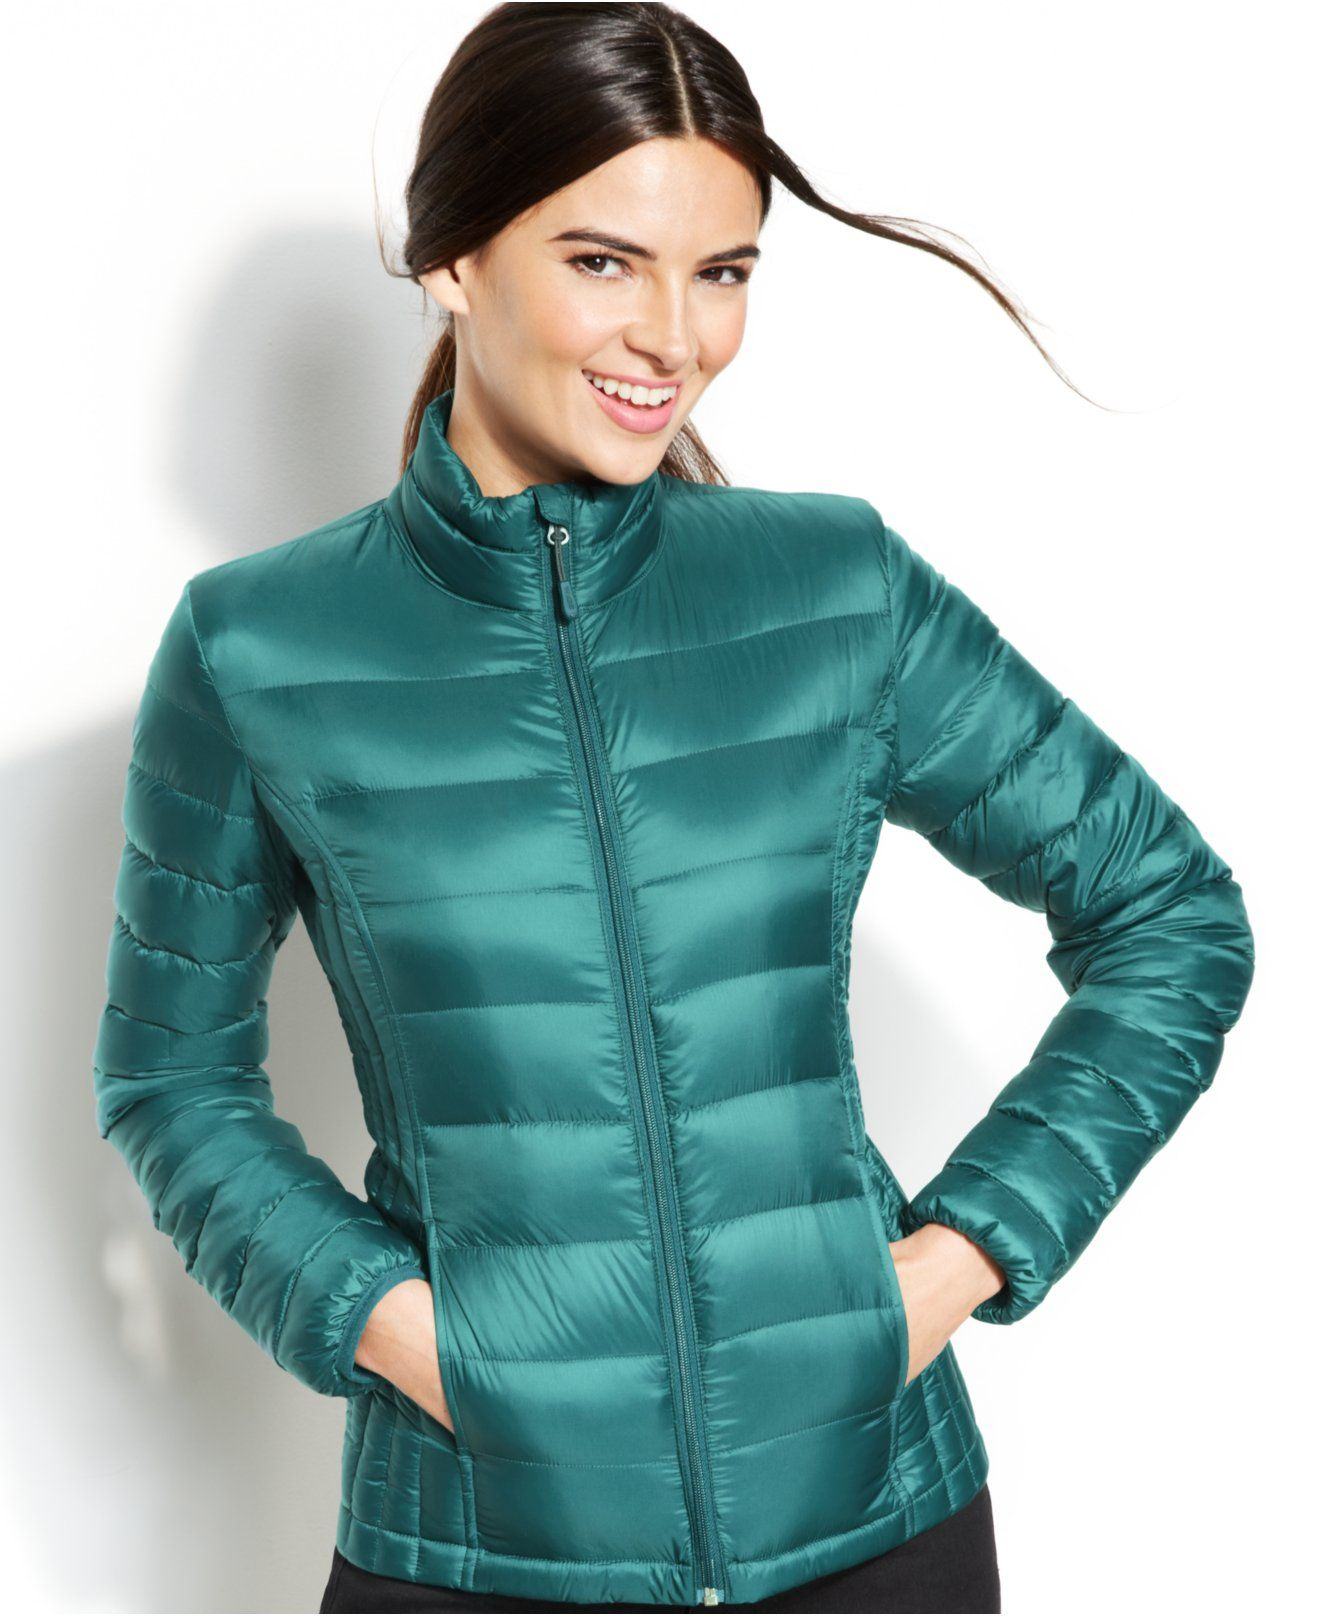 Herberger\'s Coats for Women | Dress images